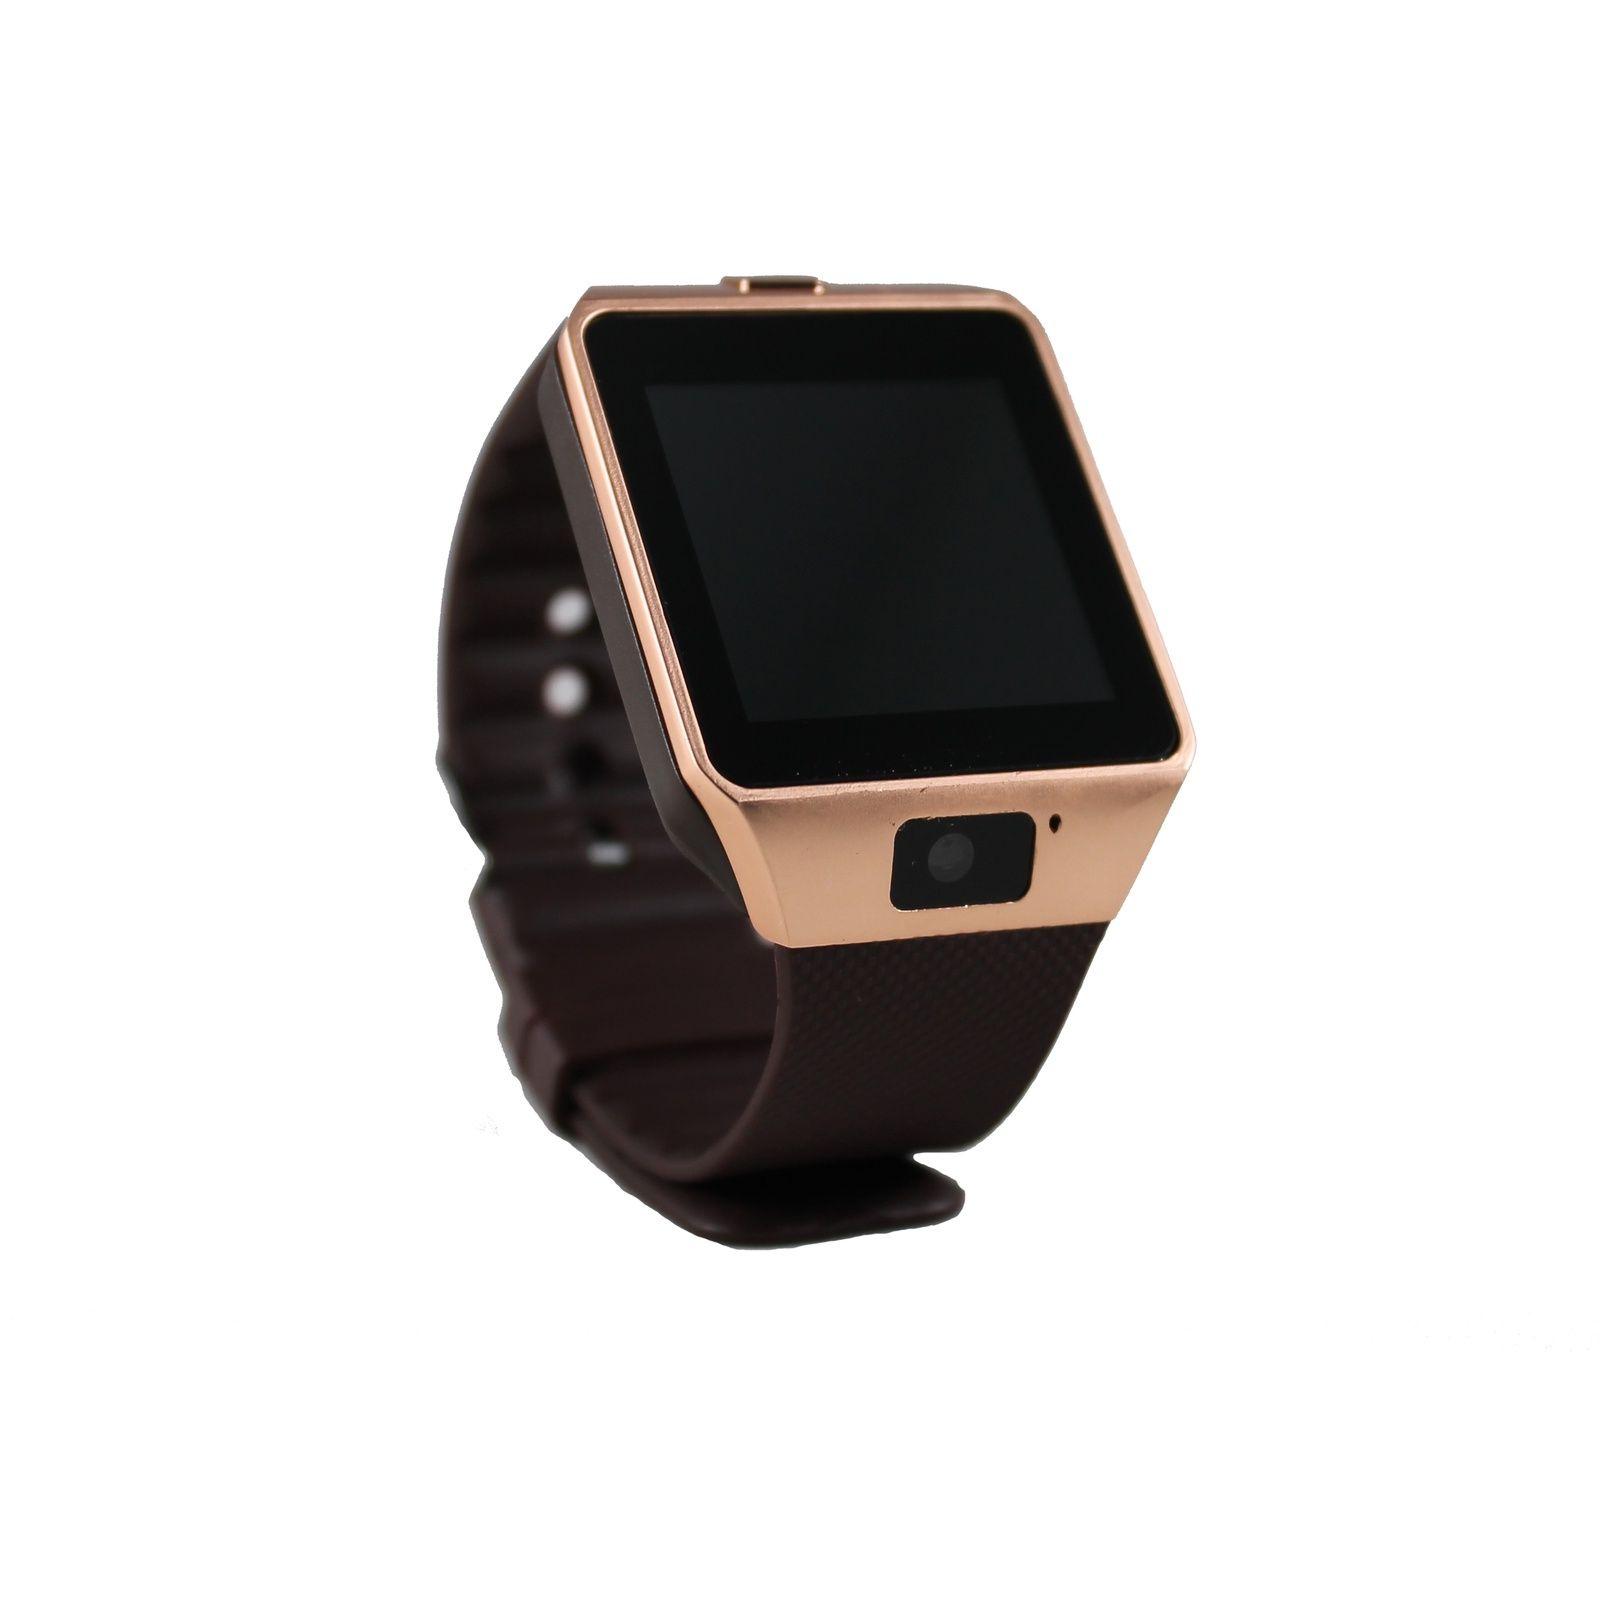 Умные часы ZDK DZ09 bronze (Android, IOS, Динамик, Микрофон, SIM, MicroSD, Камера) умные часы zdk dz09 silver